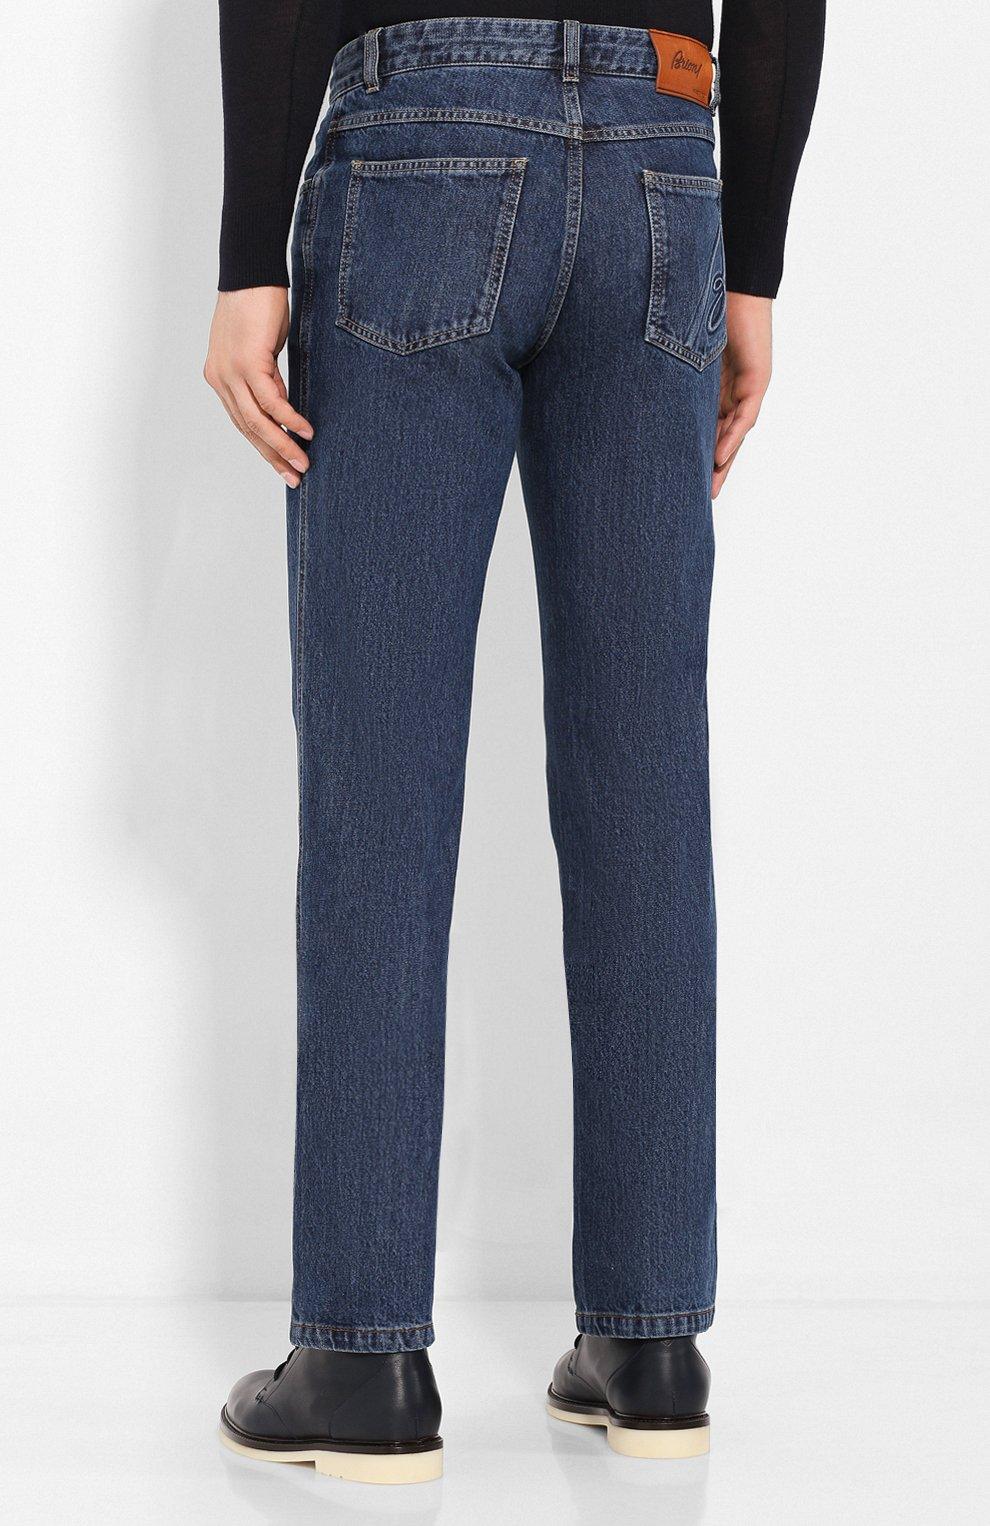 Мужские джинсы BRIONI синего цвета, арт. SPNJ0L/08D18/STELVI0 | Фото 4